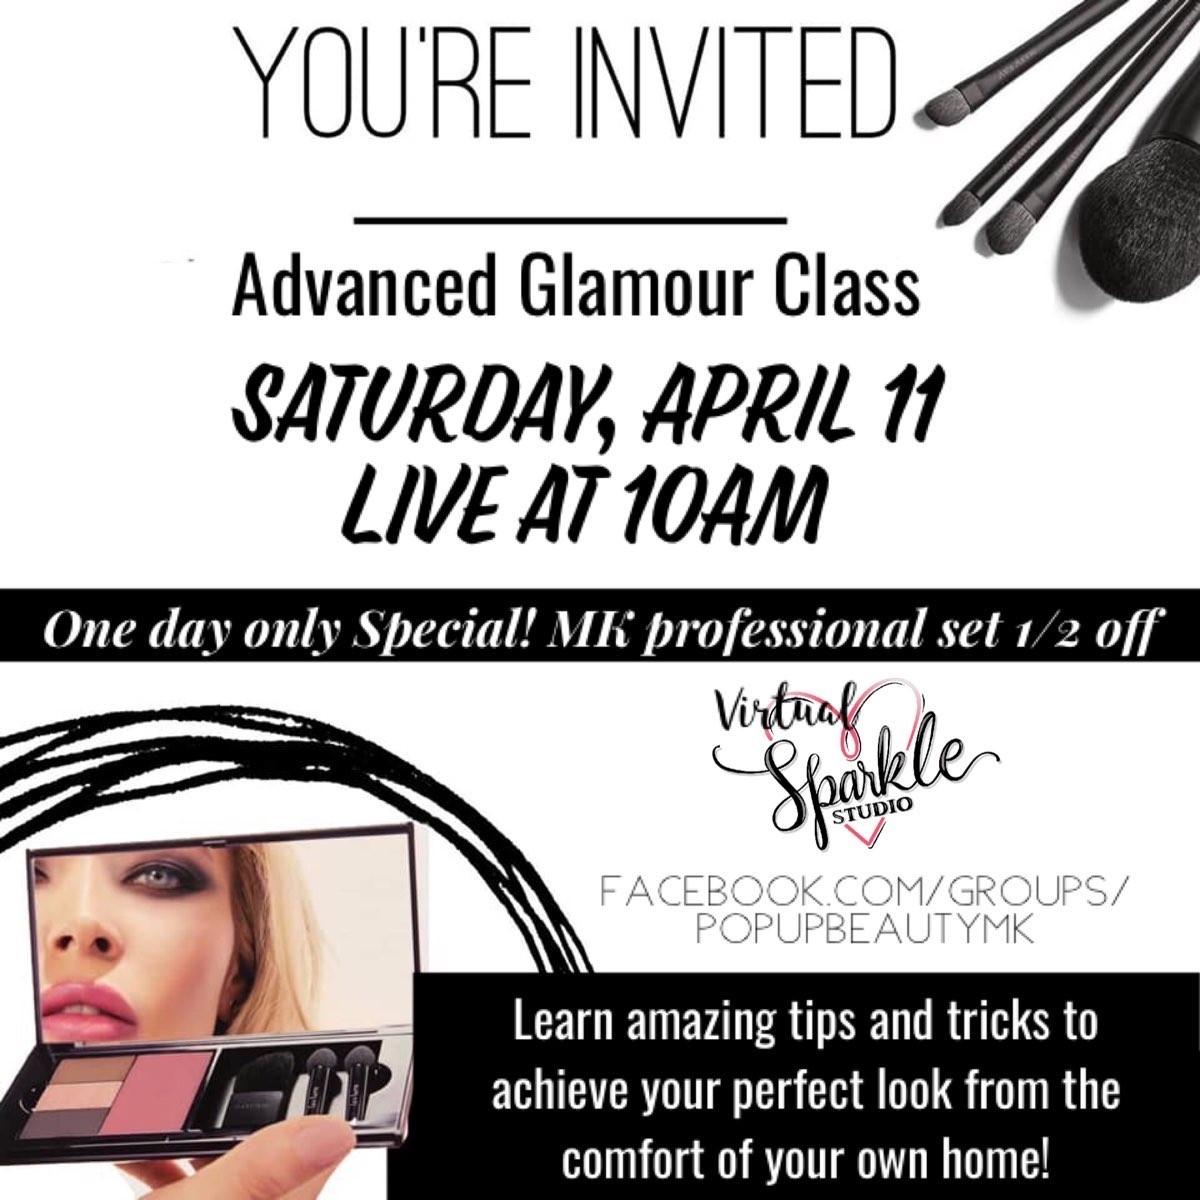 adv_glamour_class